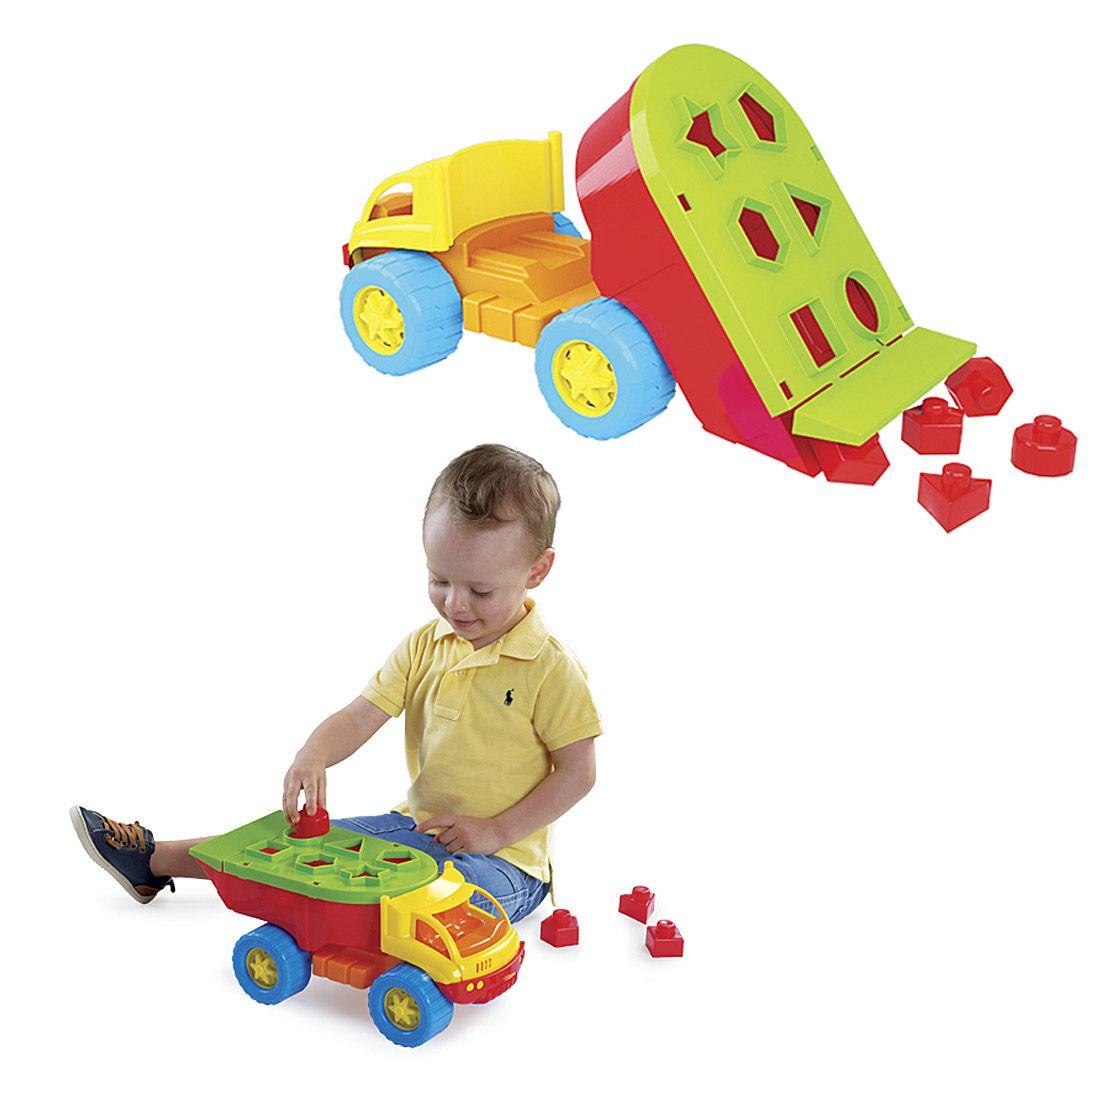 Brinquedo de Montar Caminhão de Encaixes Iron Truck MK126 Dismat